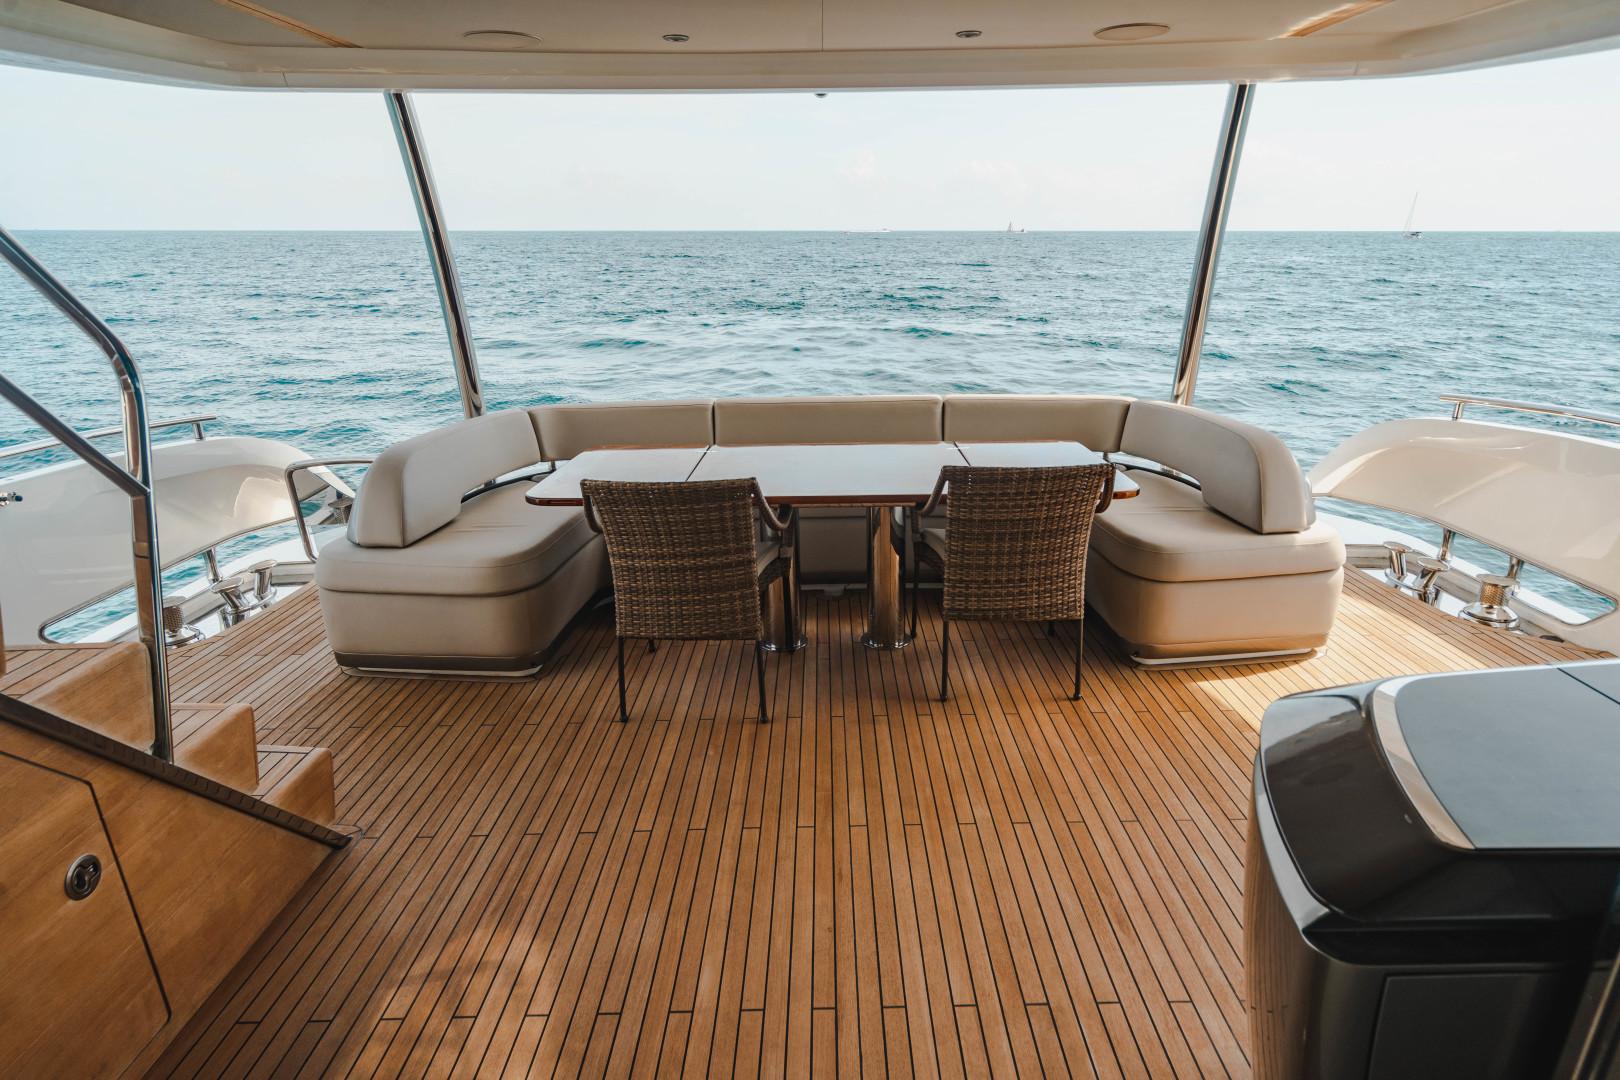 Princess-Y85  2019-Splash Delray Beach-Florida-United States-1631645 | Thumbnail